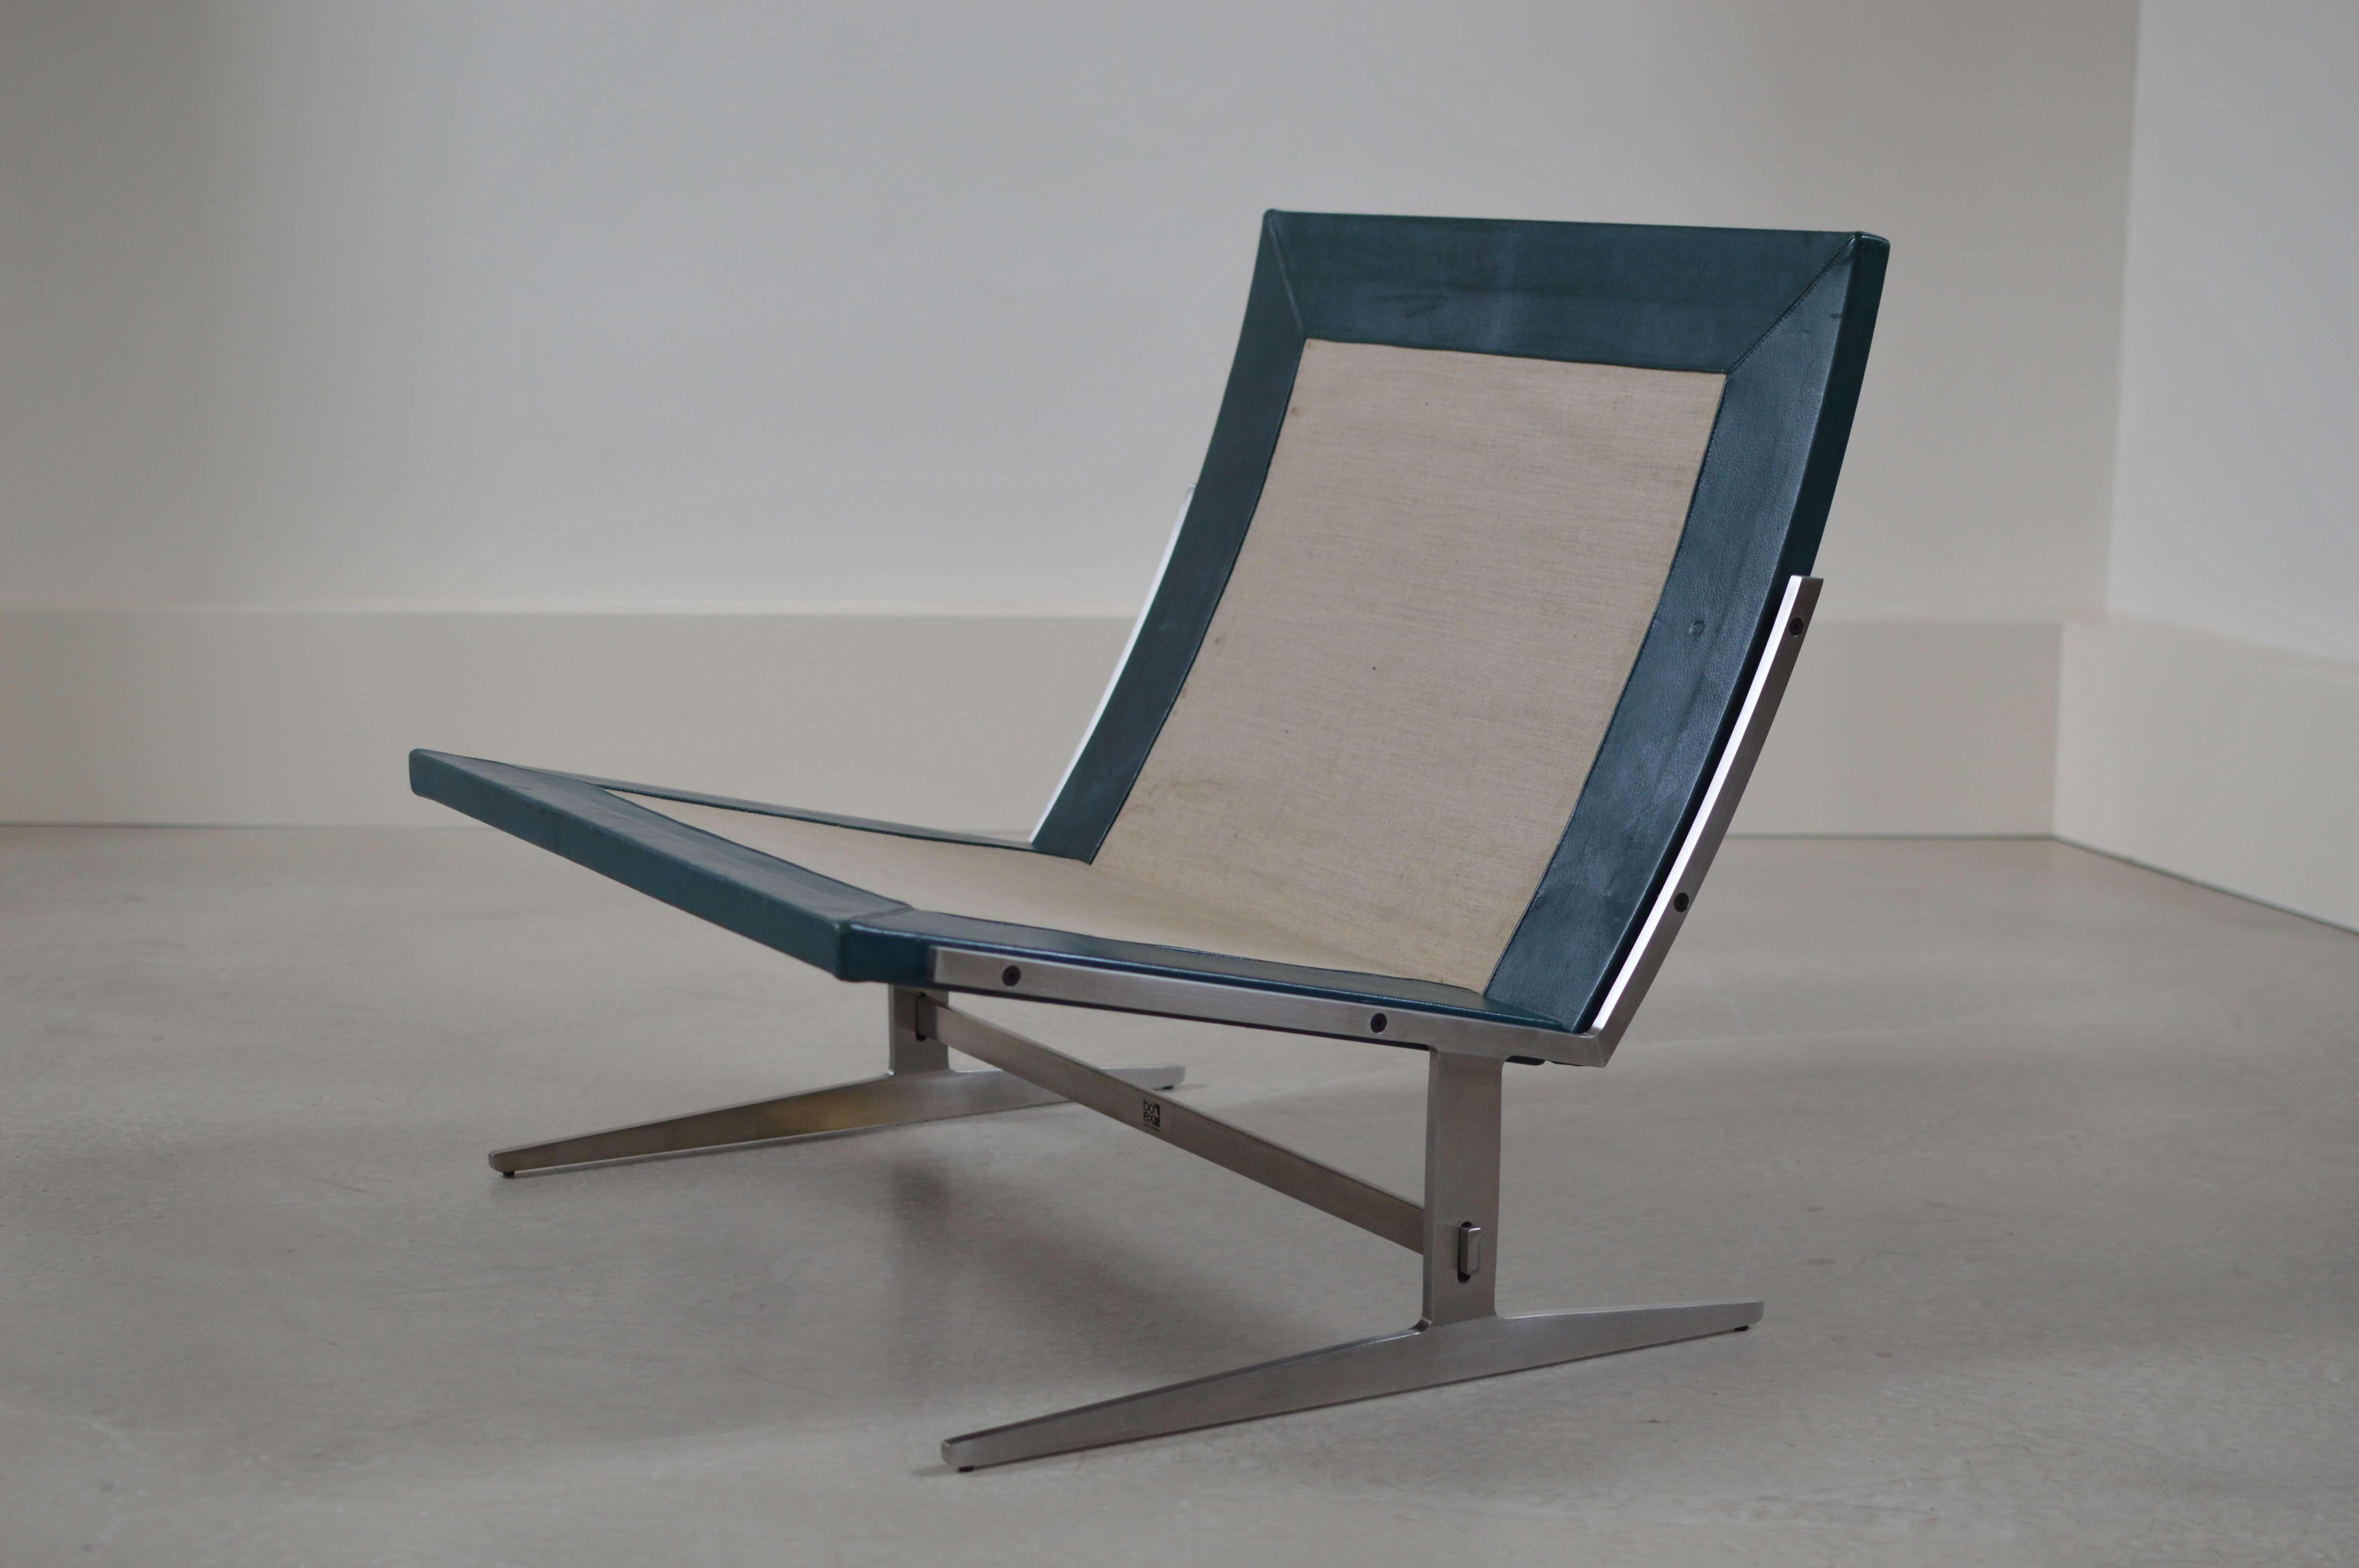 Vintage BO561 Lounge chair